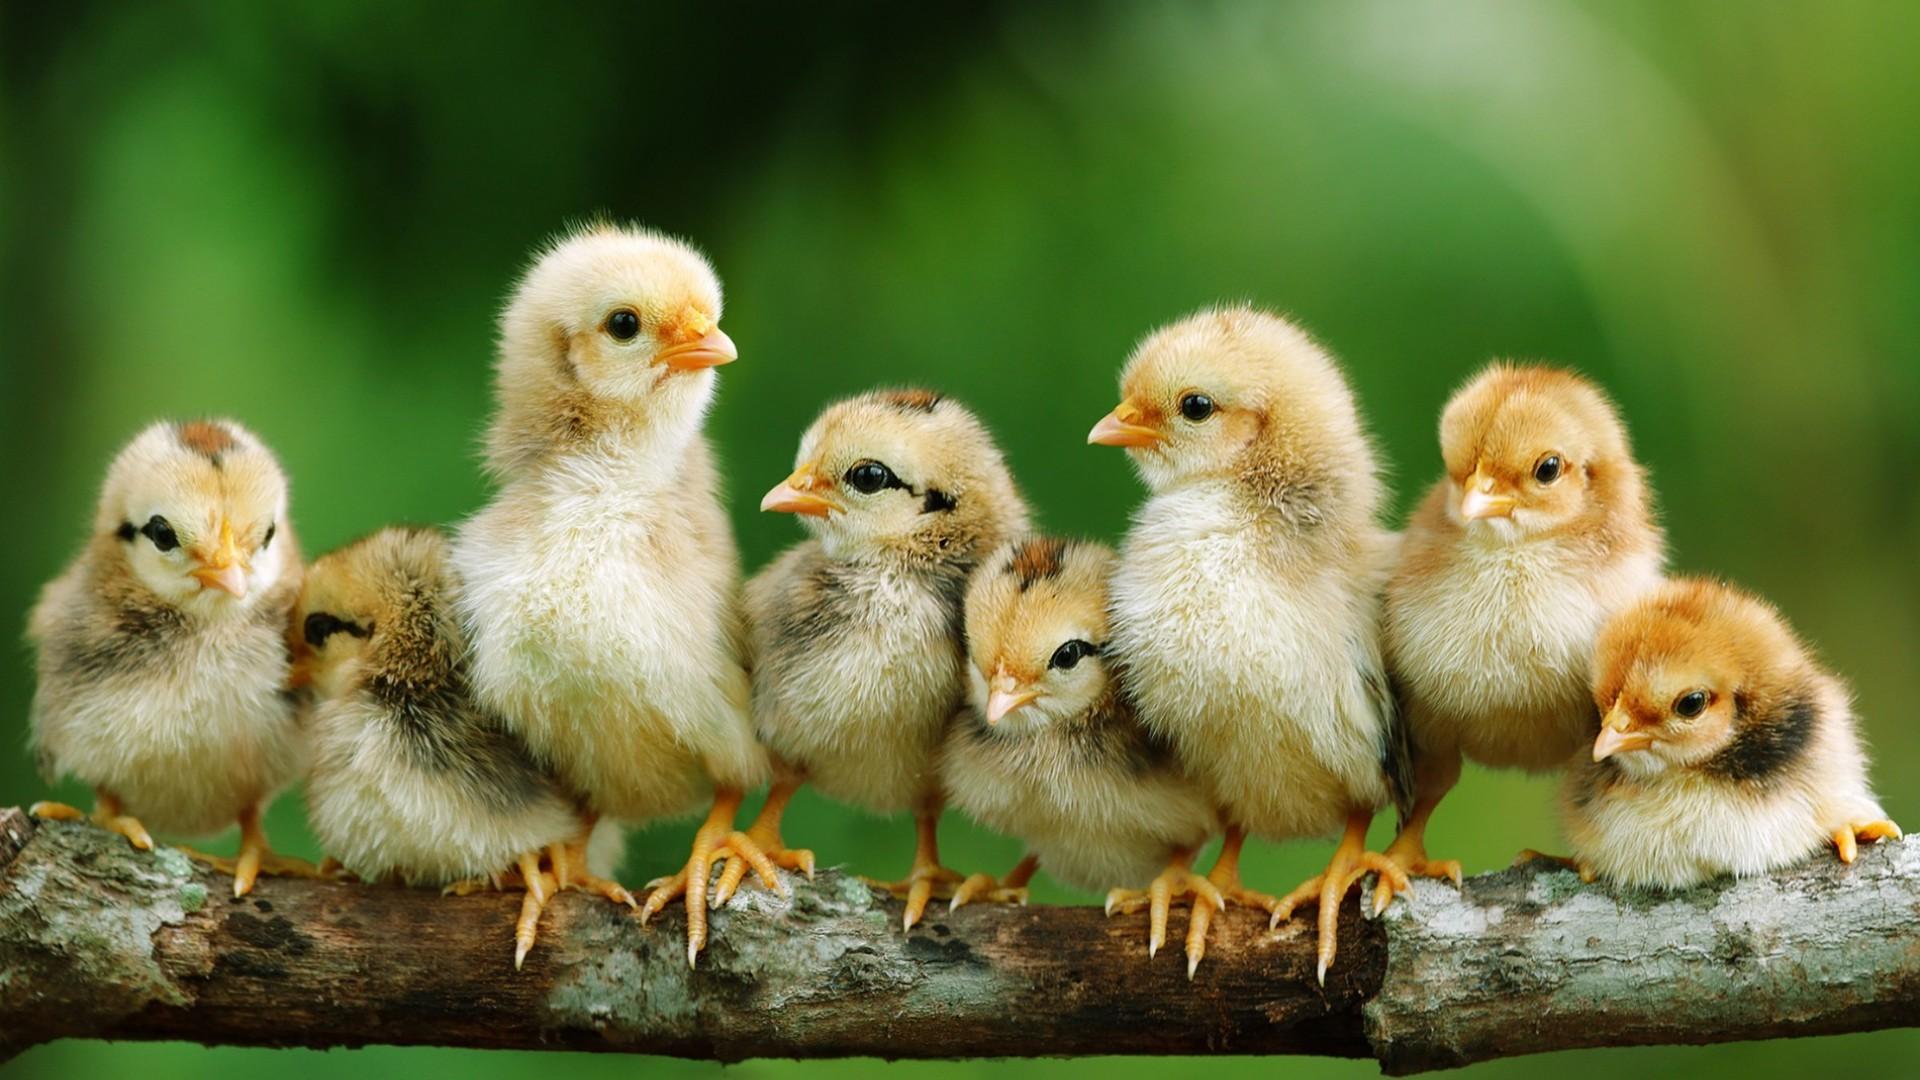 Chicken Desktop Wallpaper (10) .